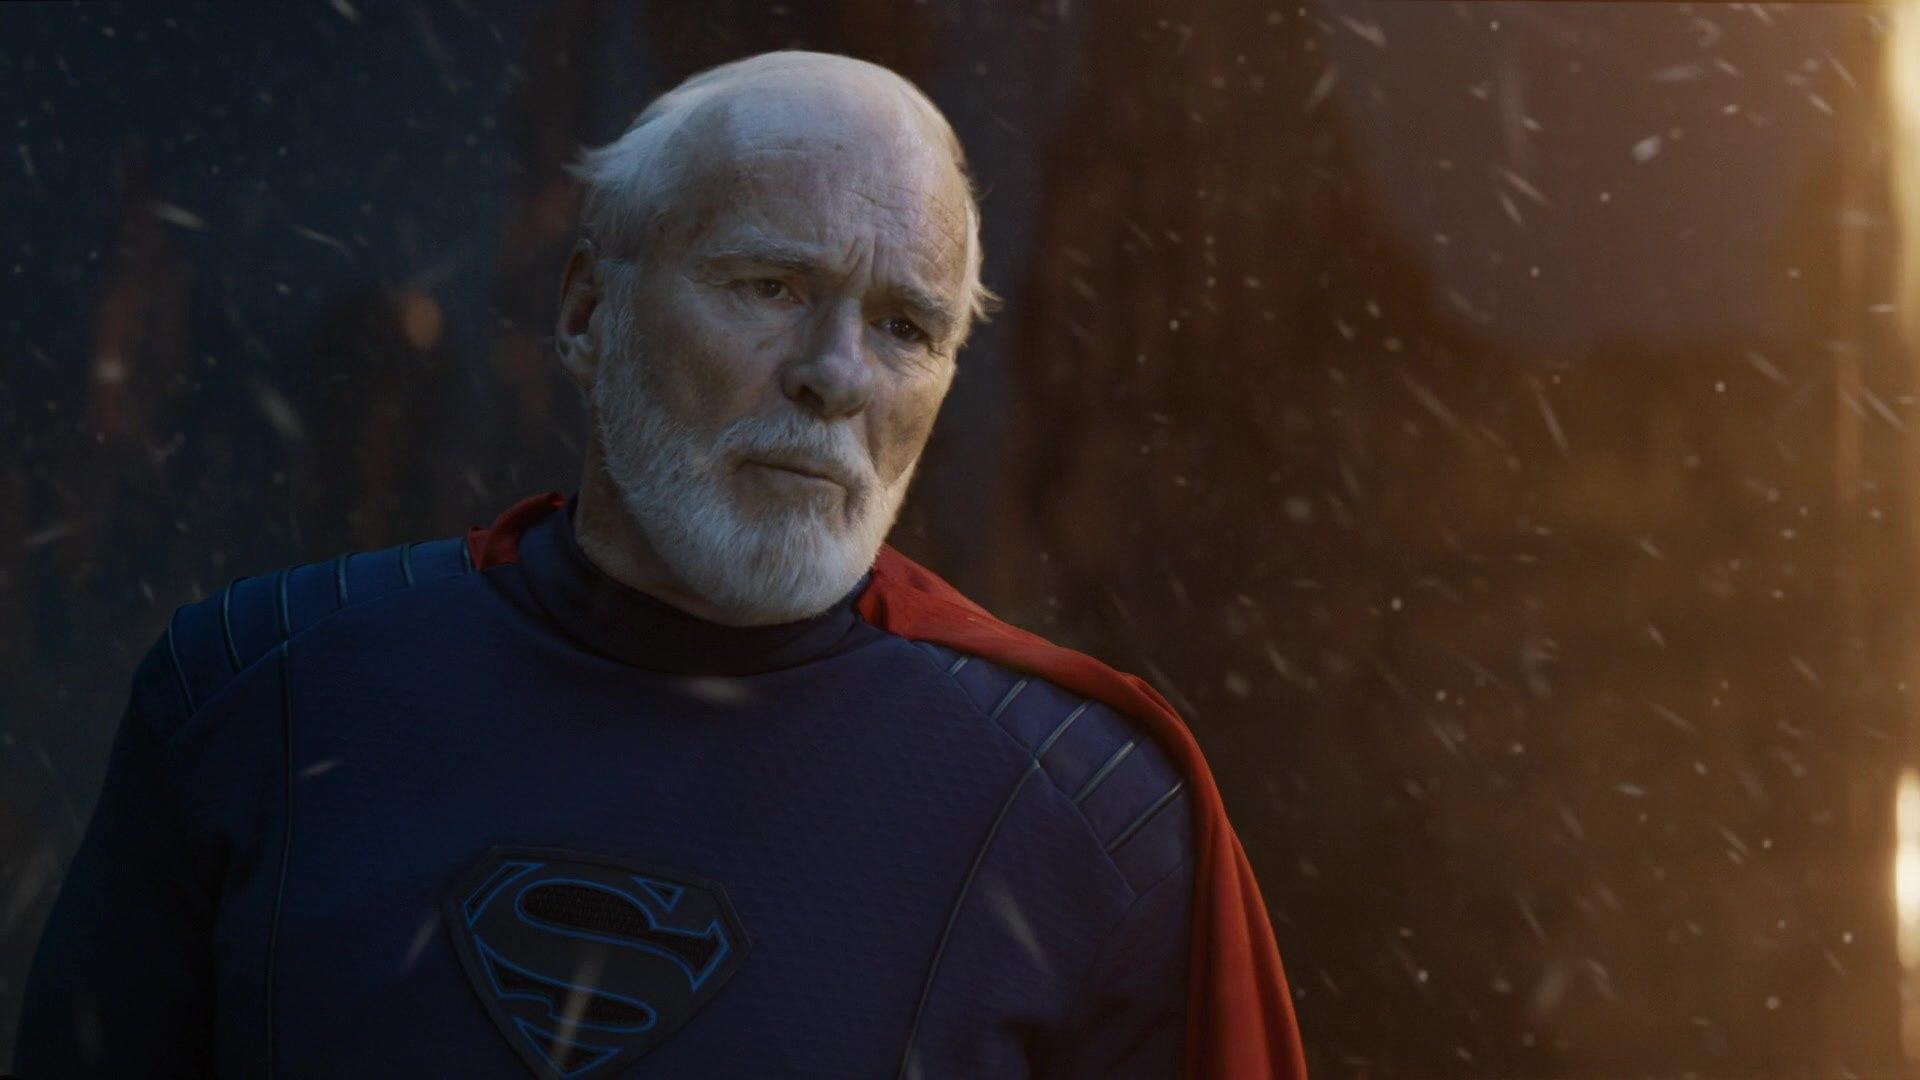 Val-El (Krypton TV Series)